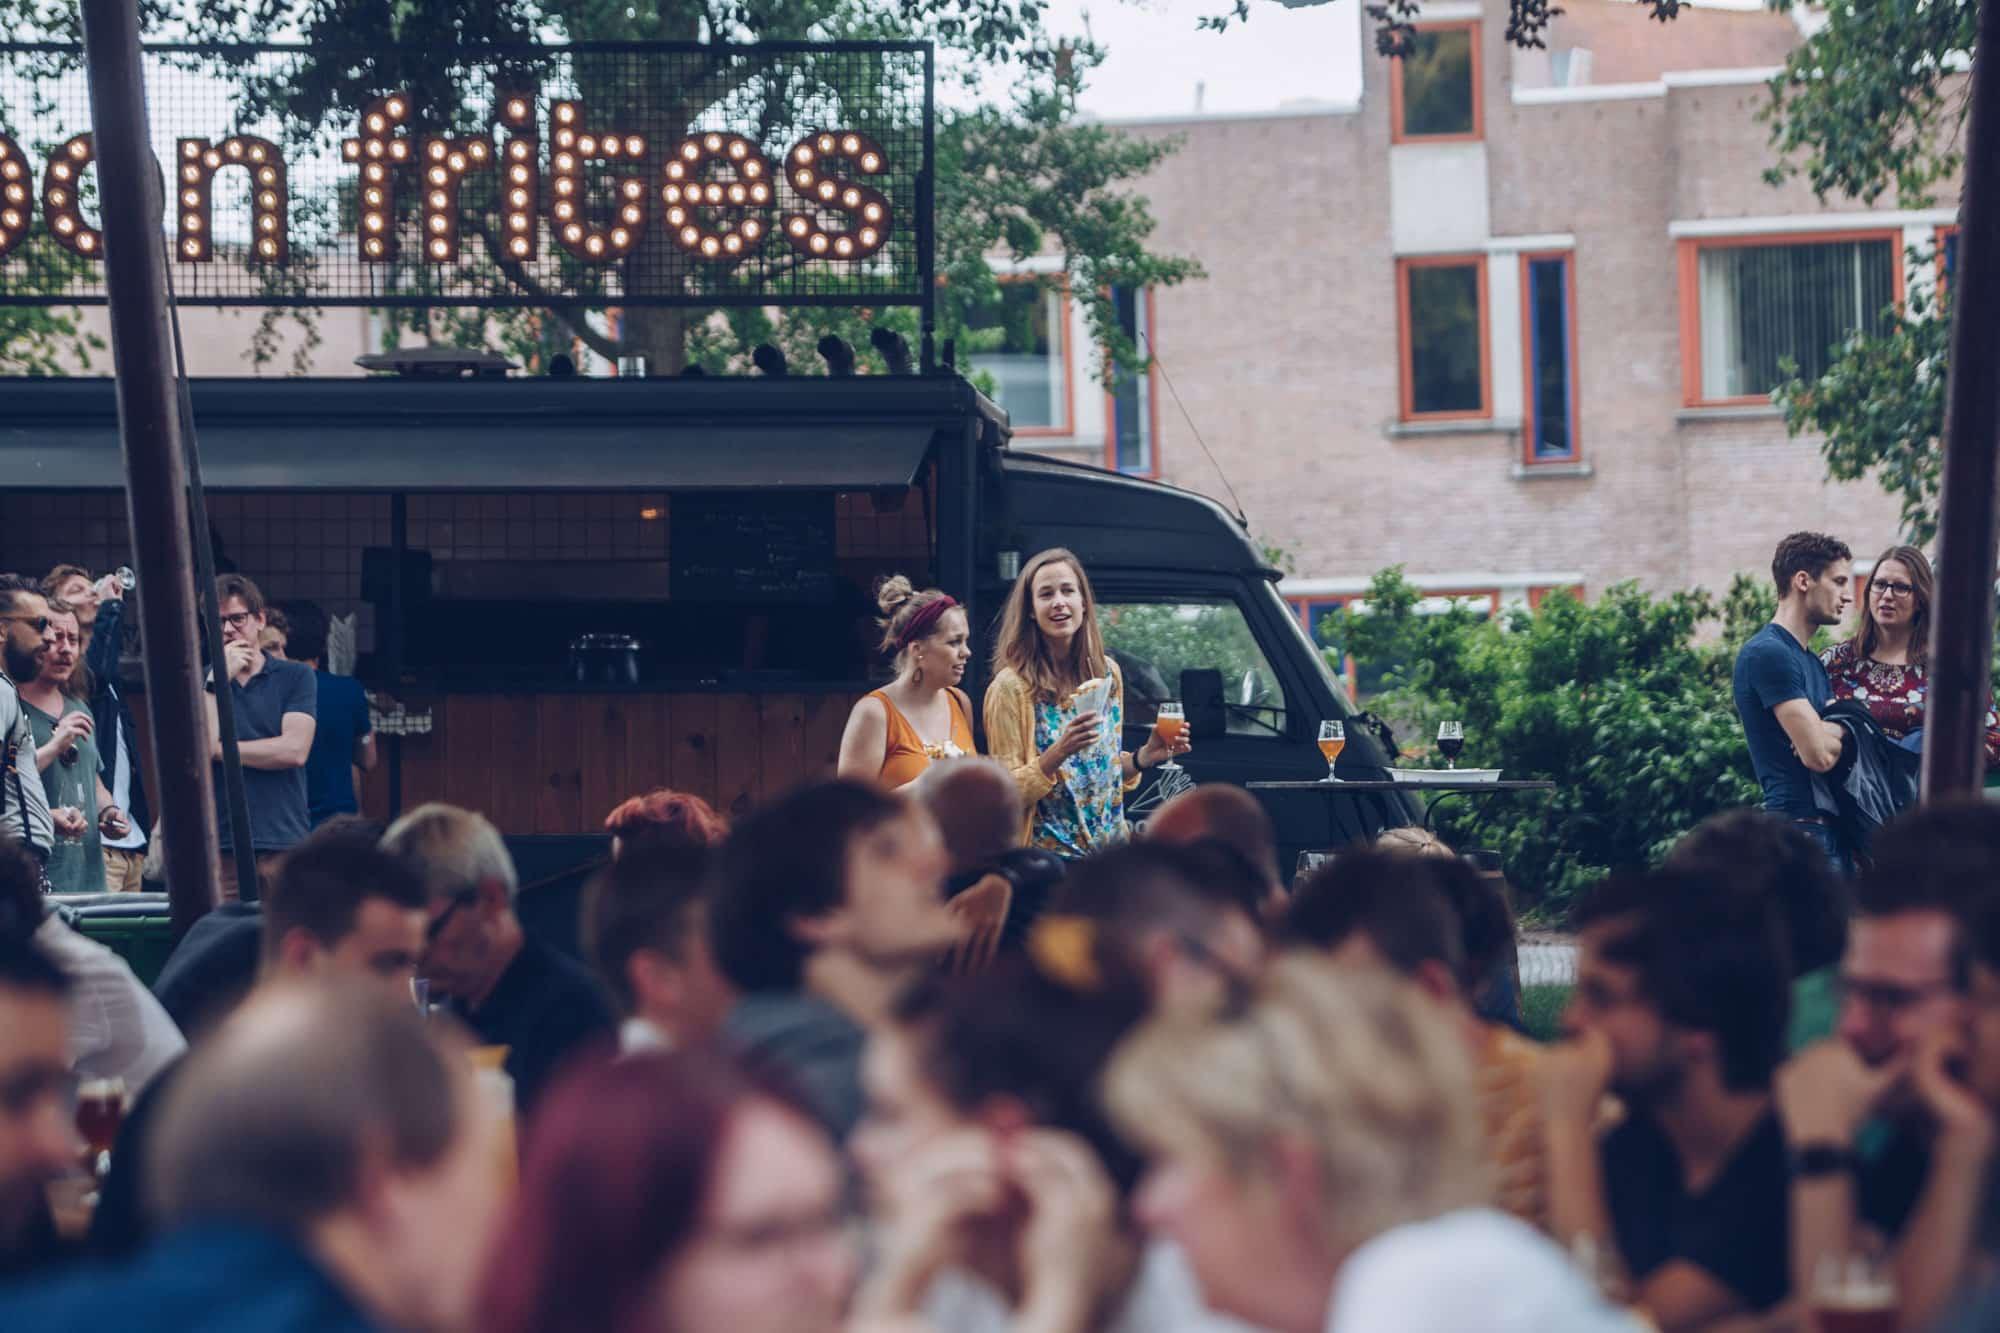 As you were - Journal, Nijmeegse Bierfeesten - Sfeerimpressie